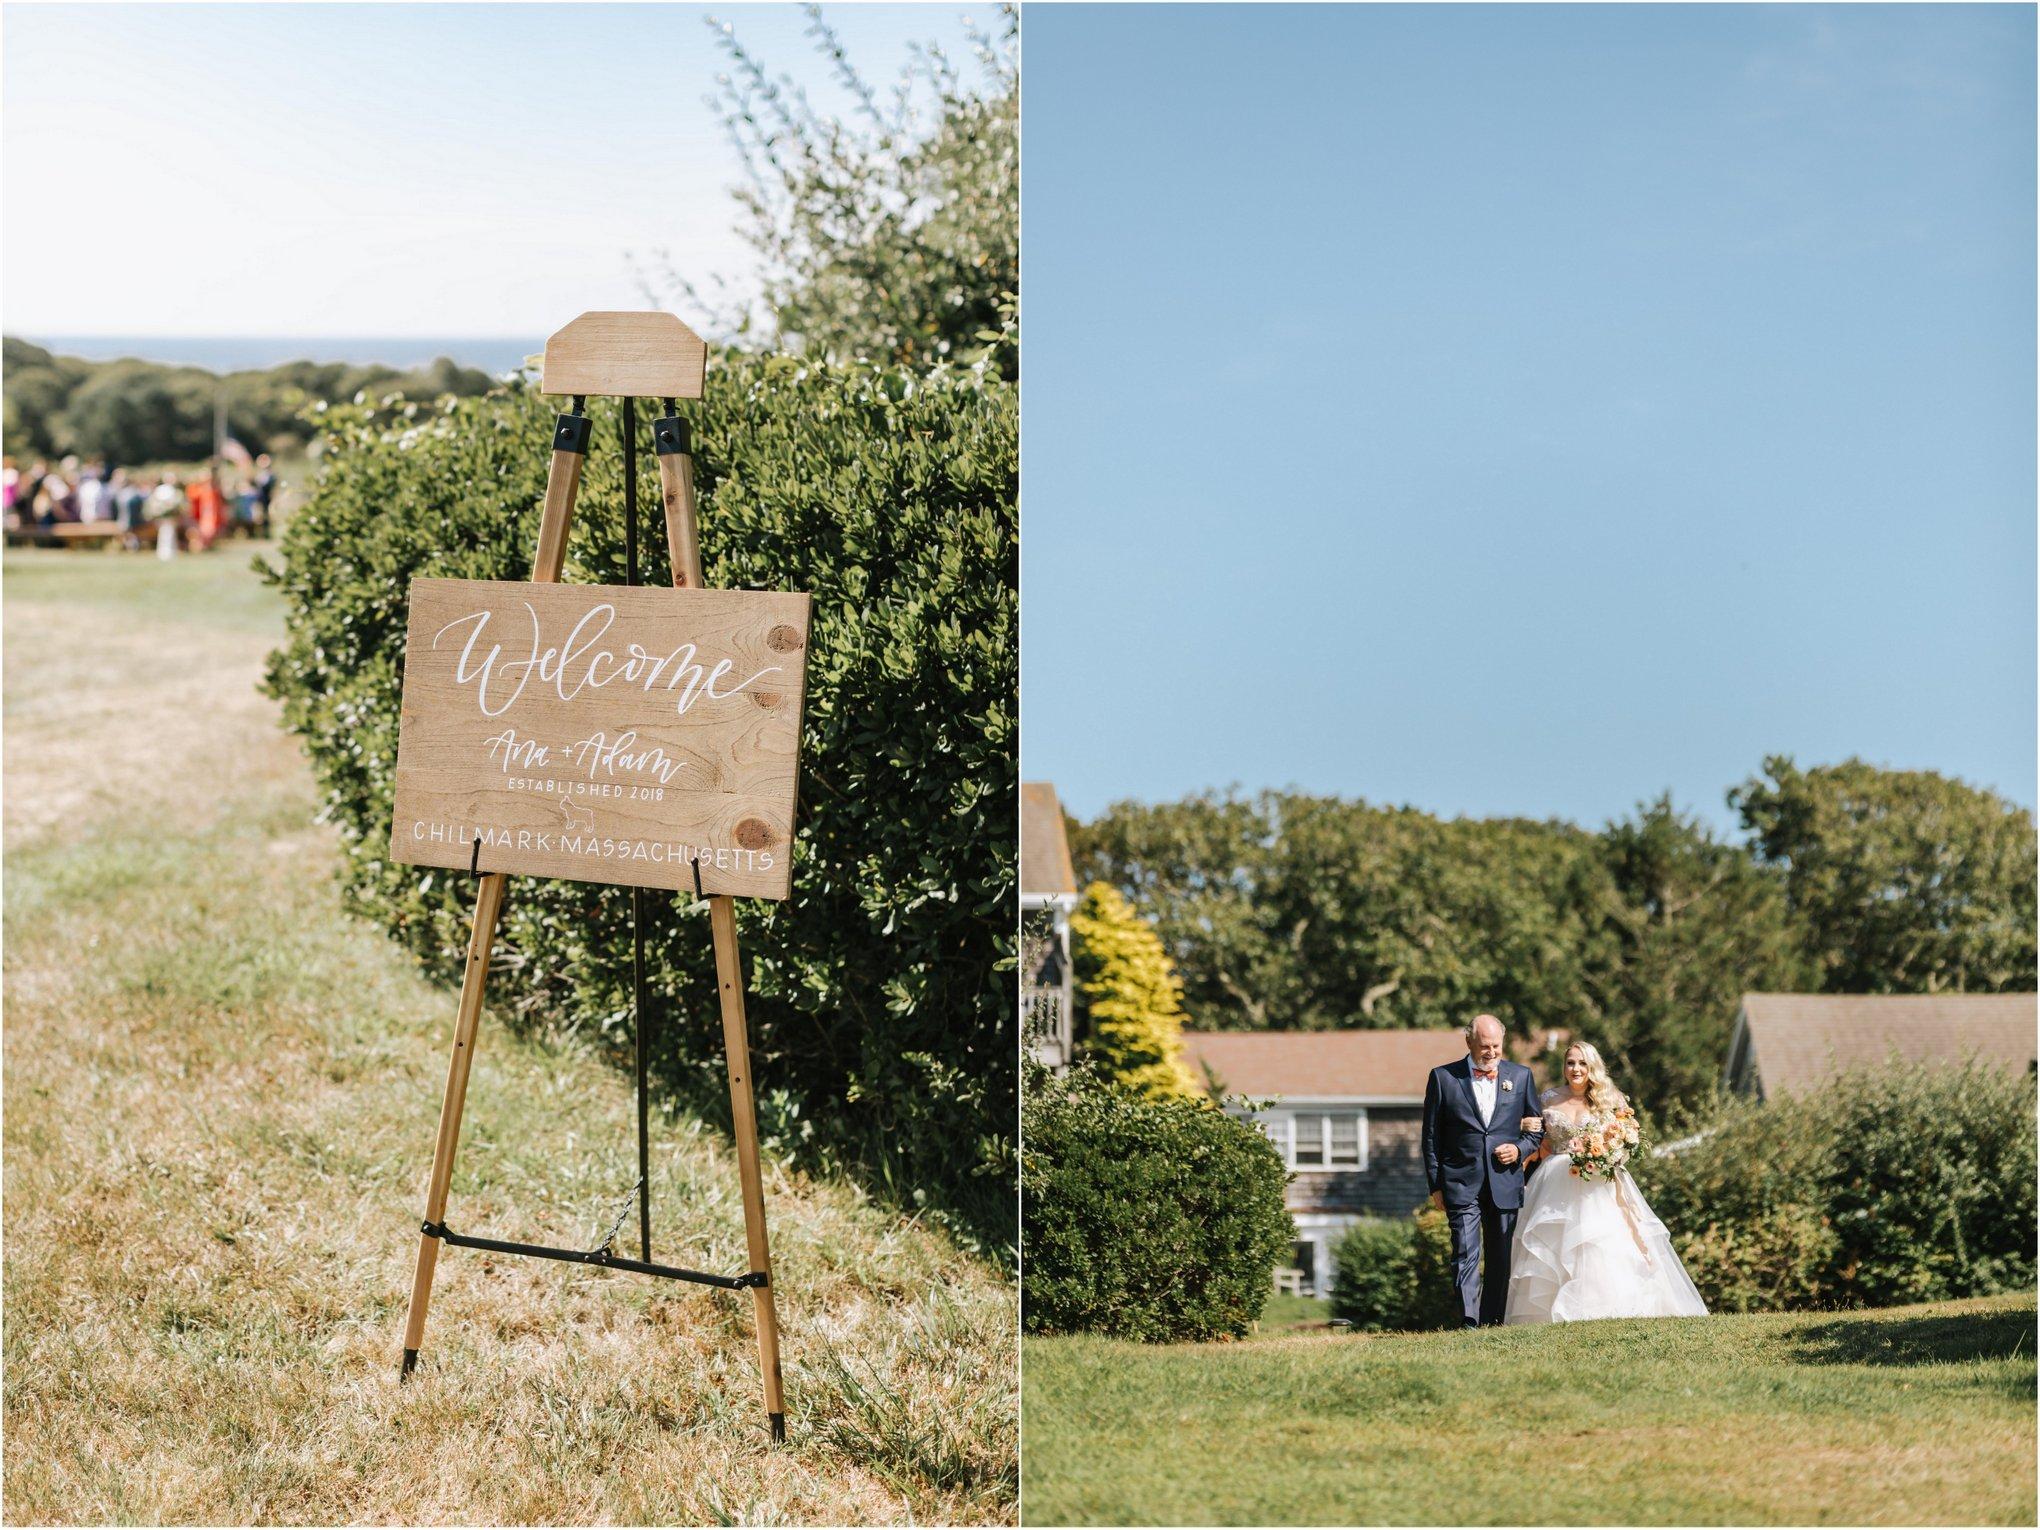 Marthas-Vineyard-Wedding-Photographer-Beach-Plum-Inn-19.jpg